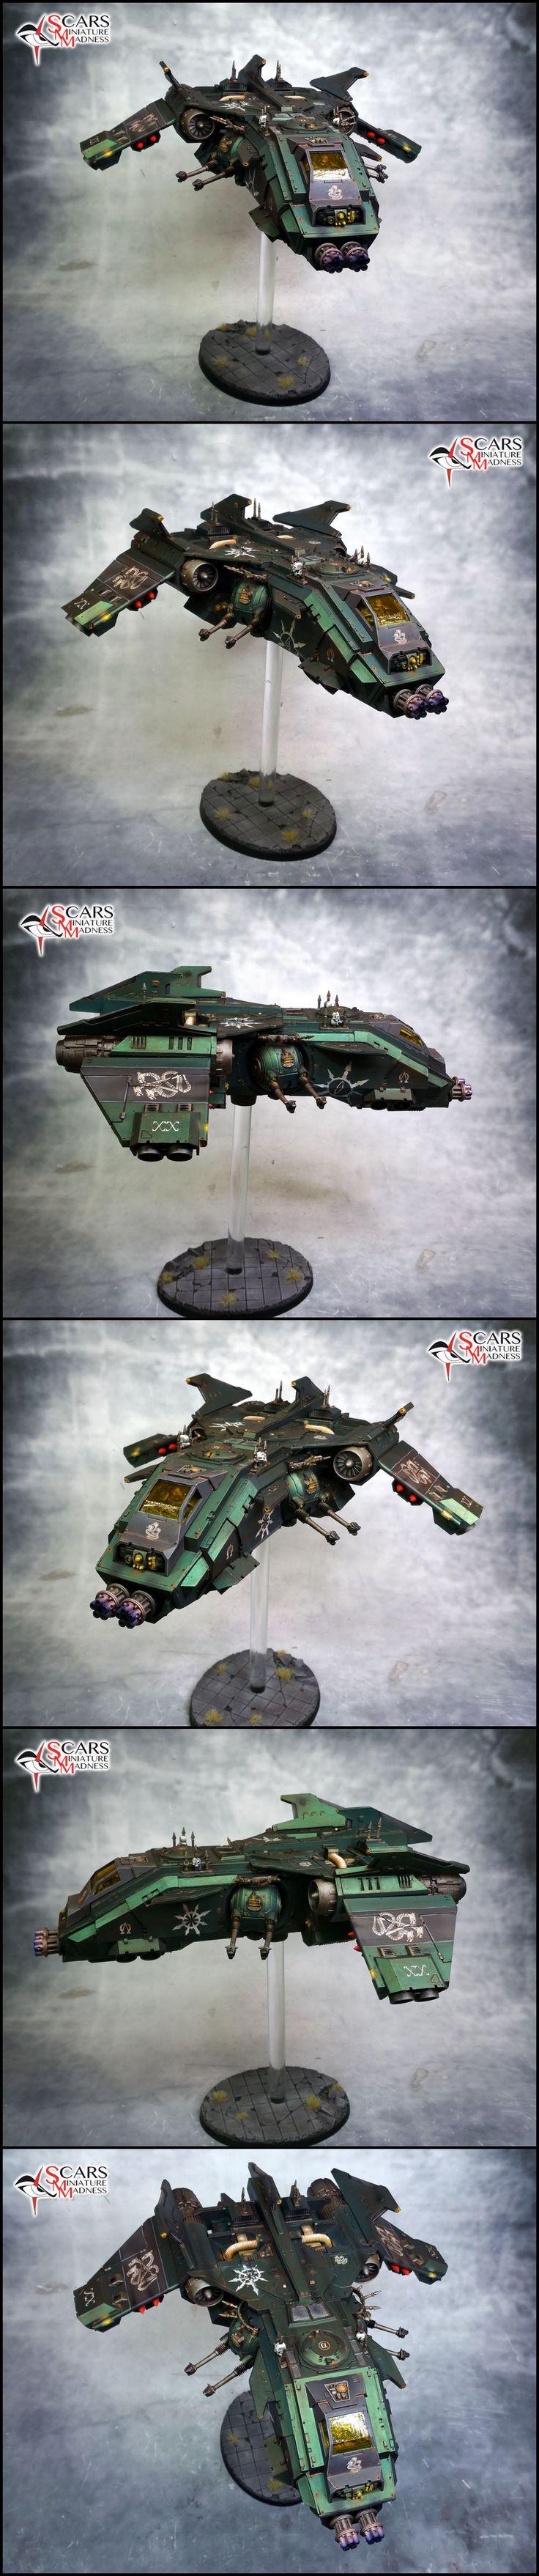 Alpha Legion Fire Raptor by Peter Zuidgeest, Scarsminiaturemadness on http://www.lounge.belloflostsouls.net/showthread.php?41307-Scarsminiaturemadness&p=525106#post525106